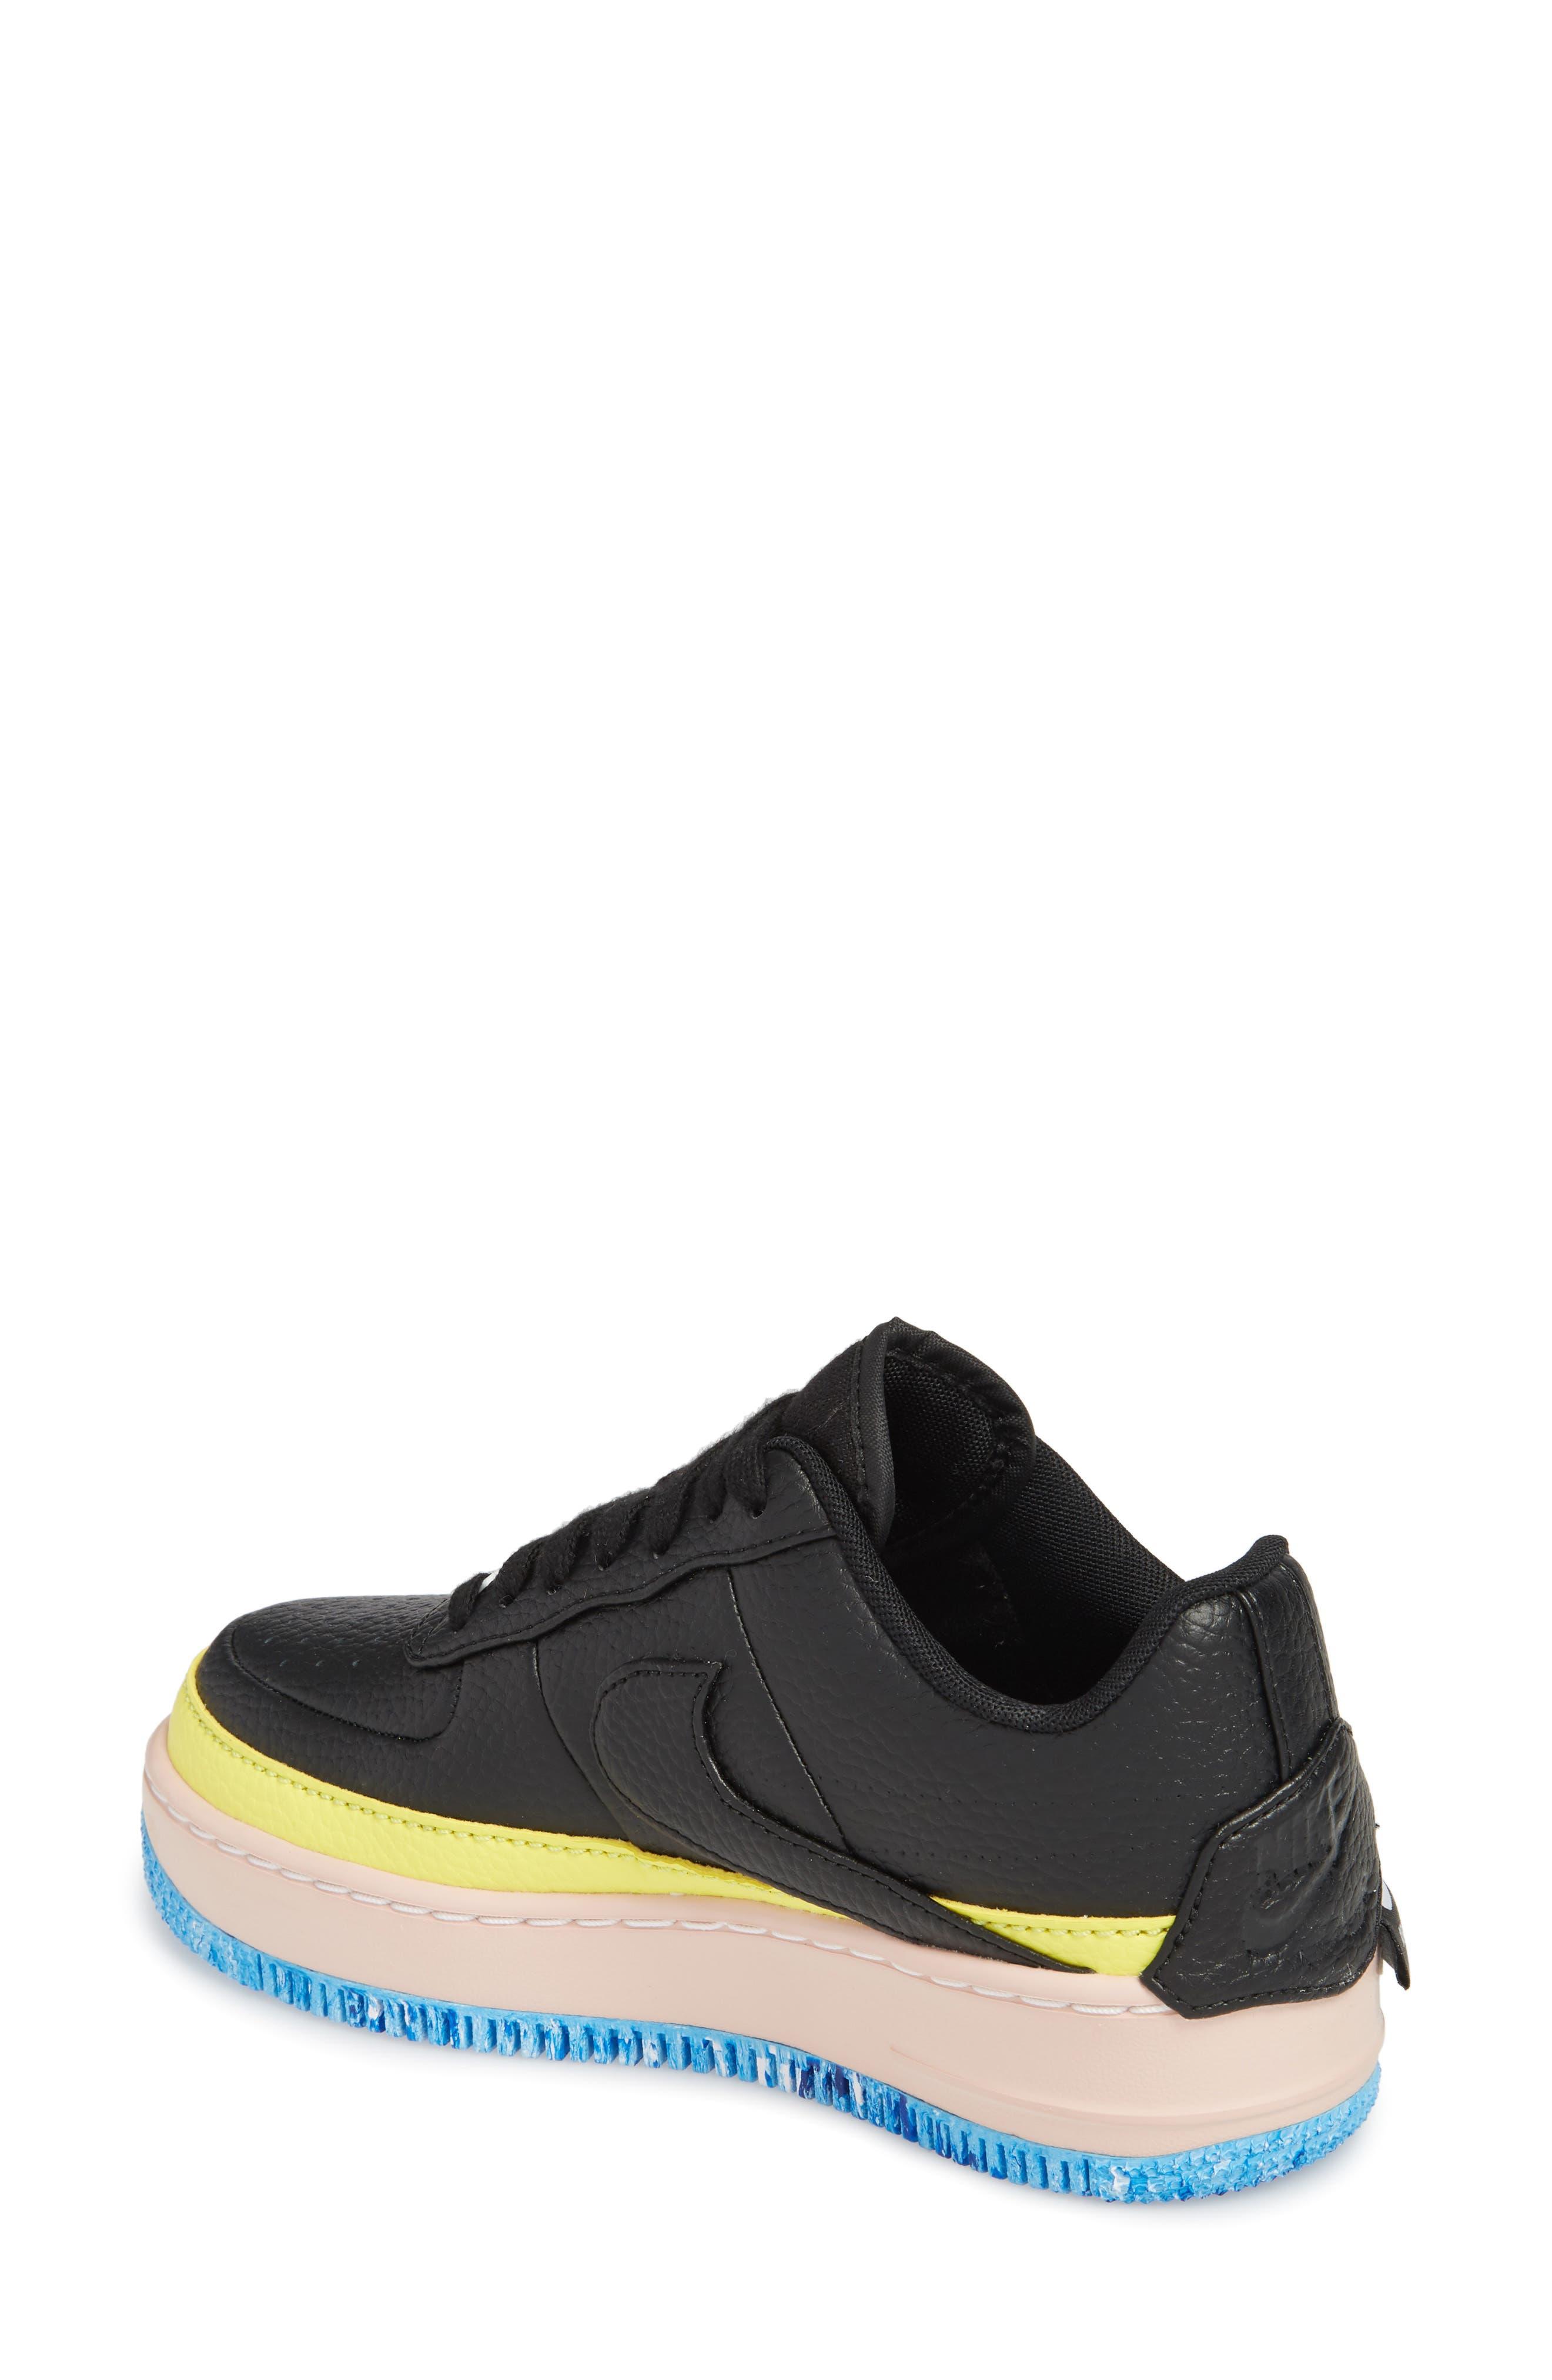 Air Force 1 Jester XX Sneaker,                             Alternate thumbnail 2, color,                             BLACK/ SONIC YELLOW/ ORANGE